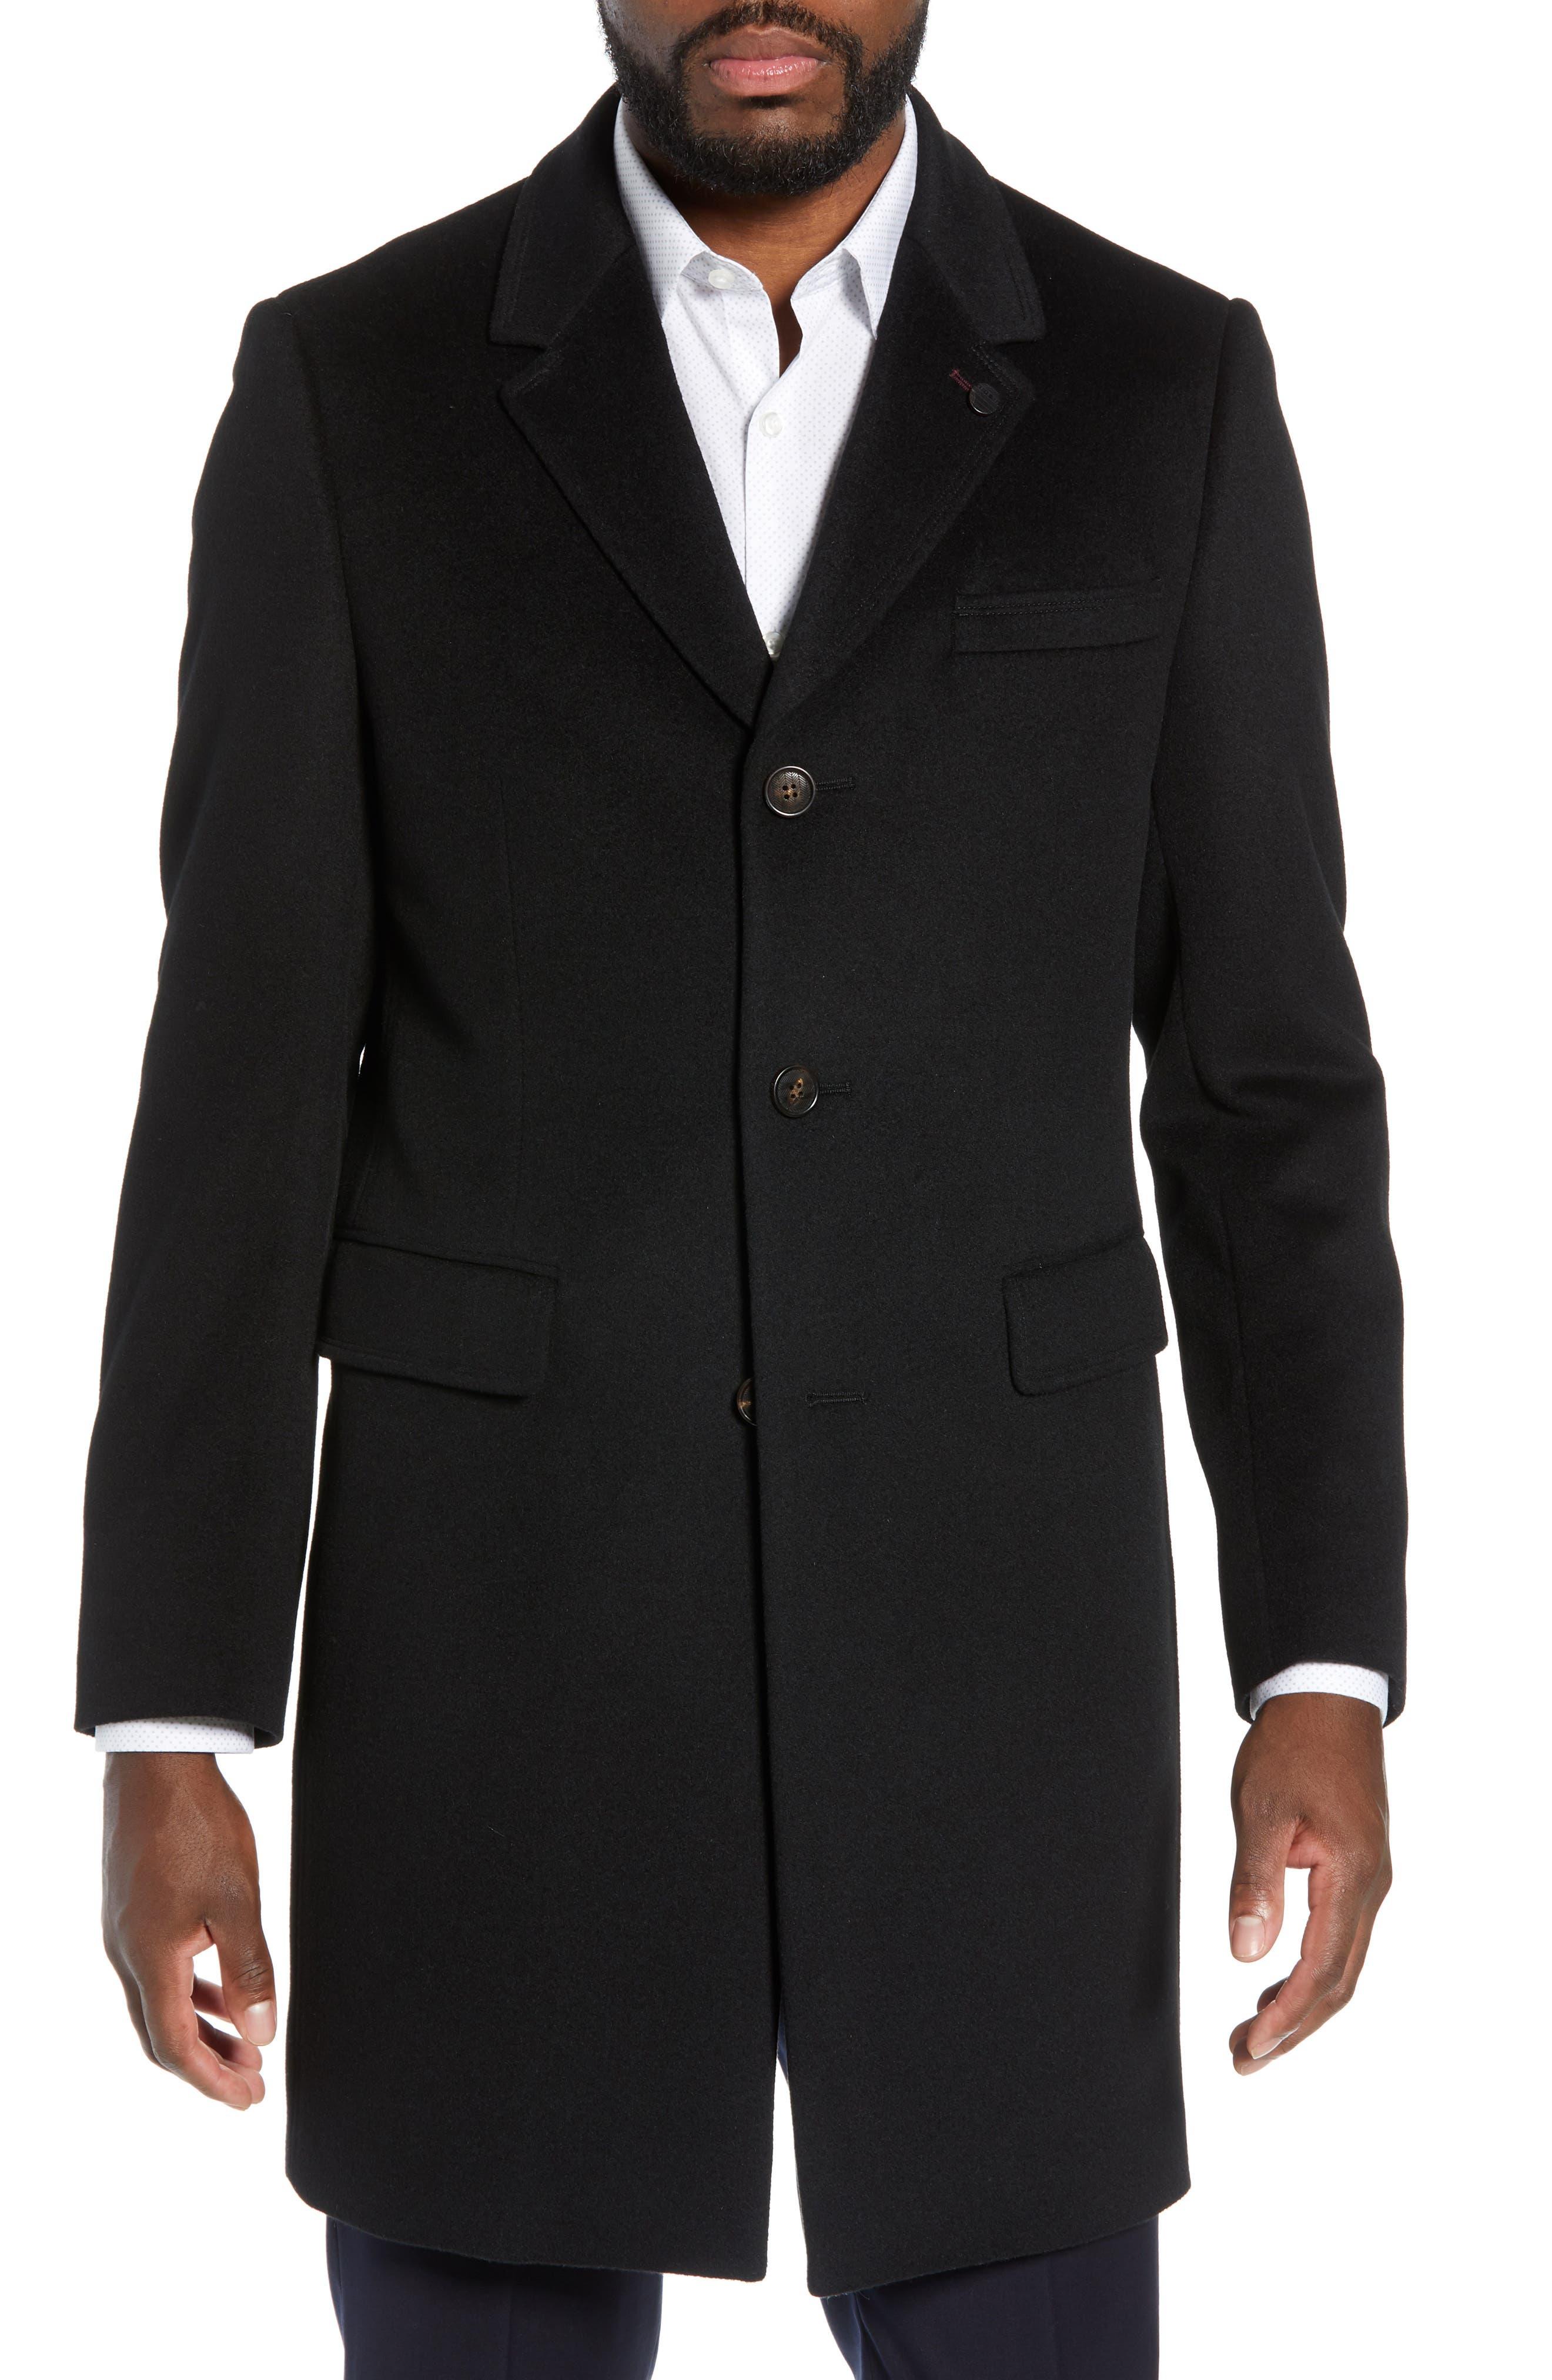 Swish Wool & Cashmere Overcoat,                             Main thumbnail 1, color,                             001